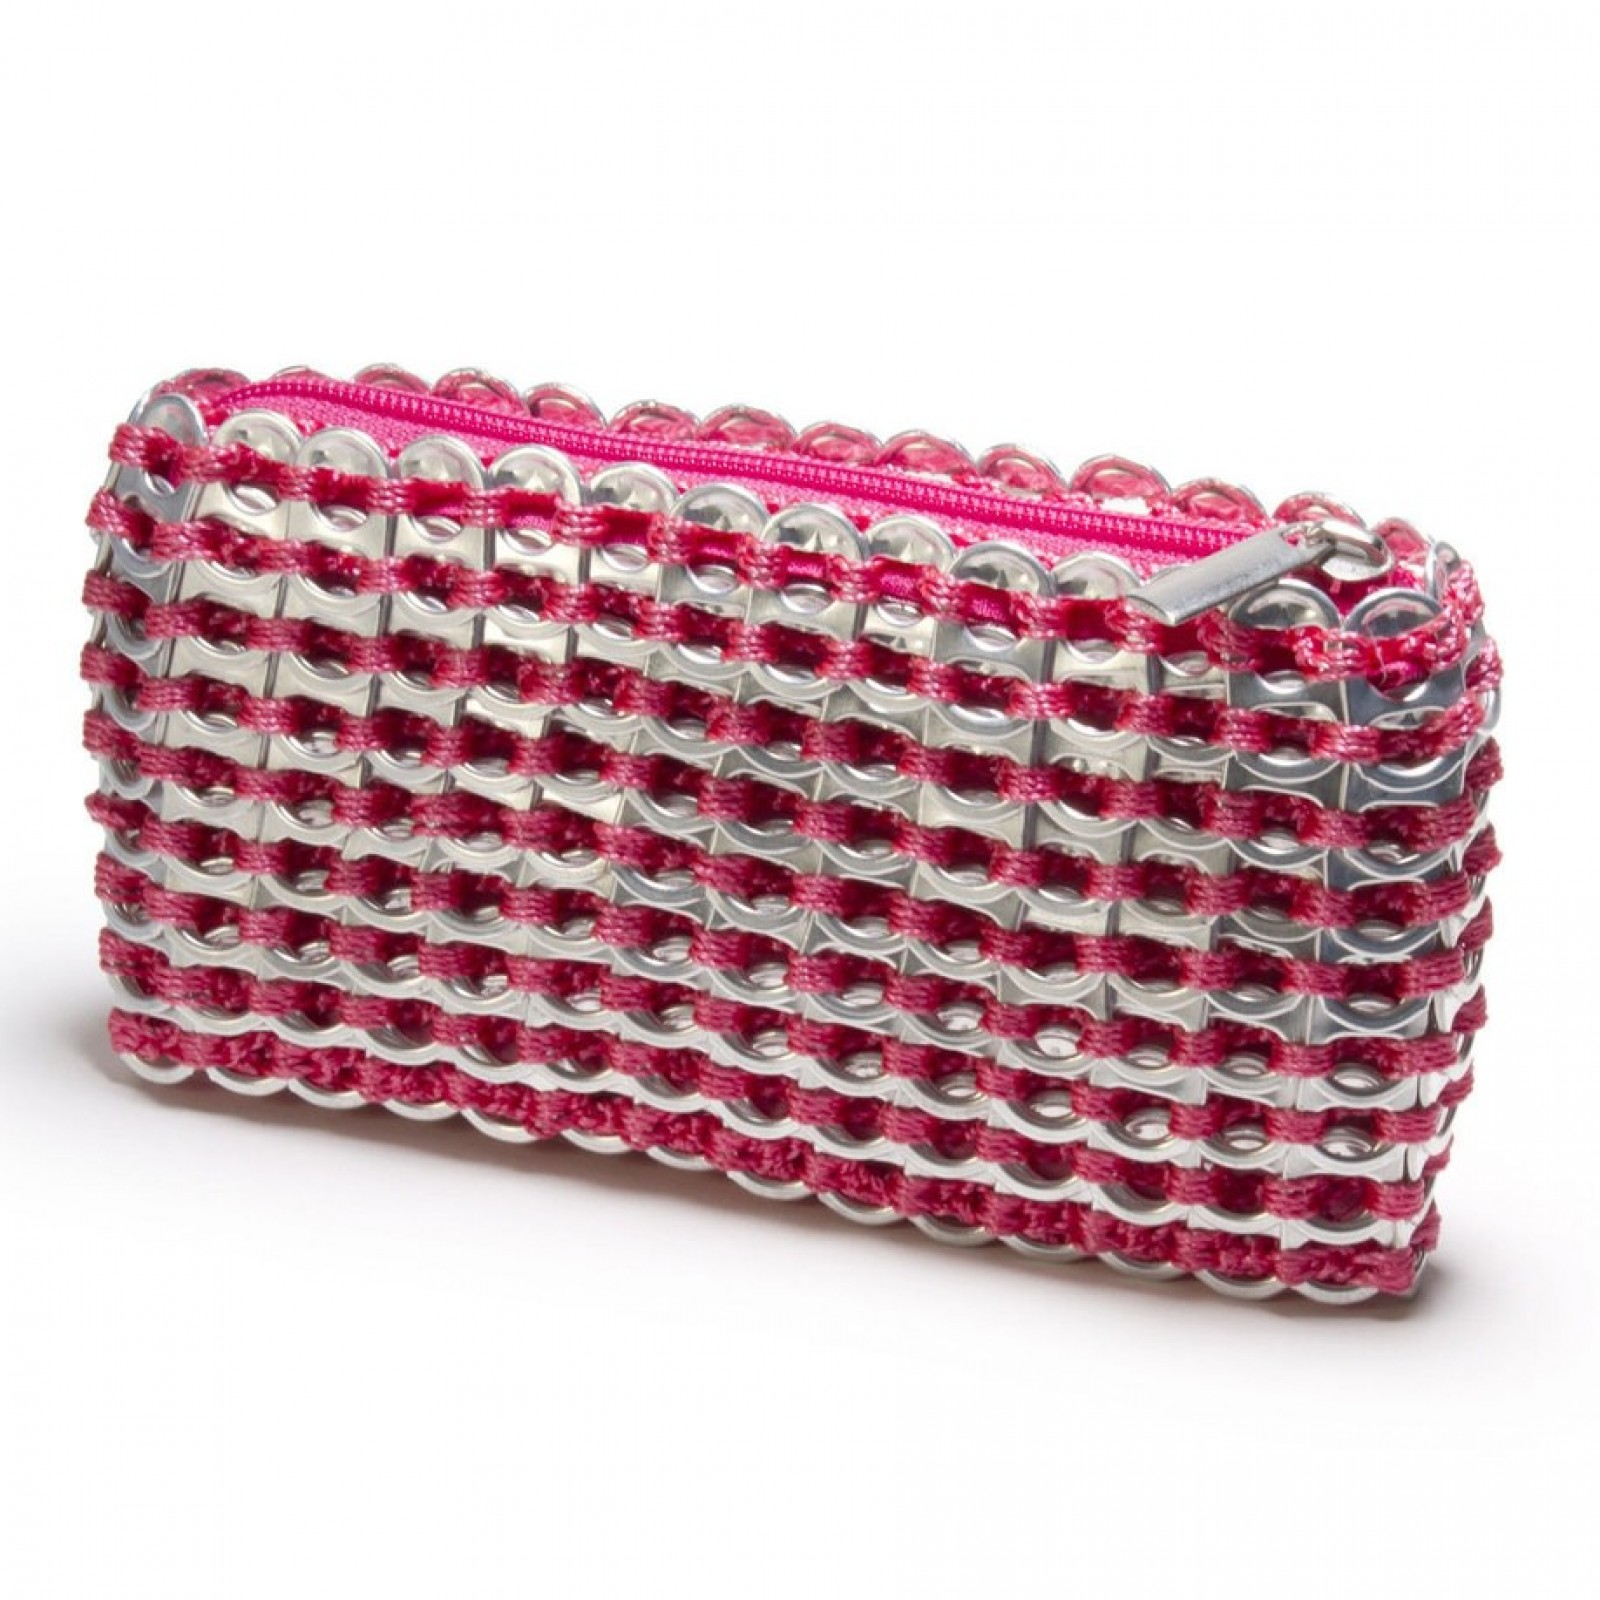 Chica Rosa Pop Top Mini Clutch (Pink) - Escama Studio